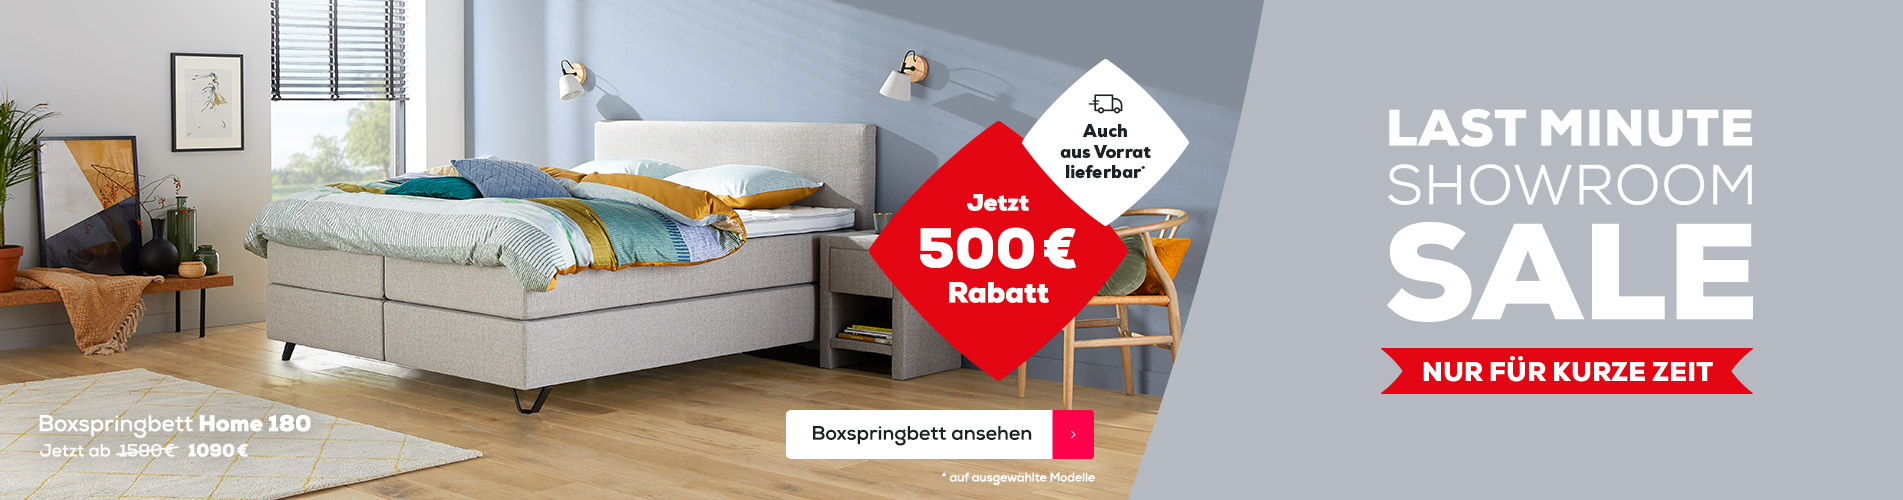 Boxspringbett Home 365 - LMSS | Swiss Sense